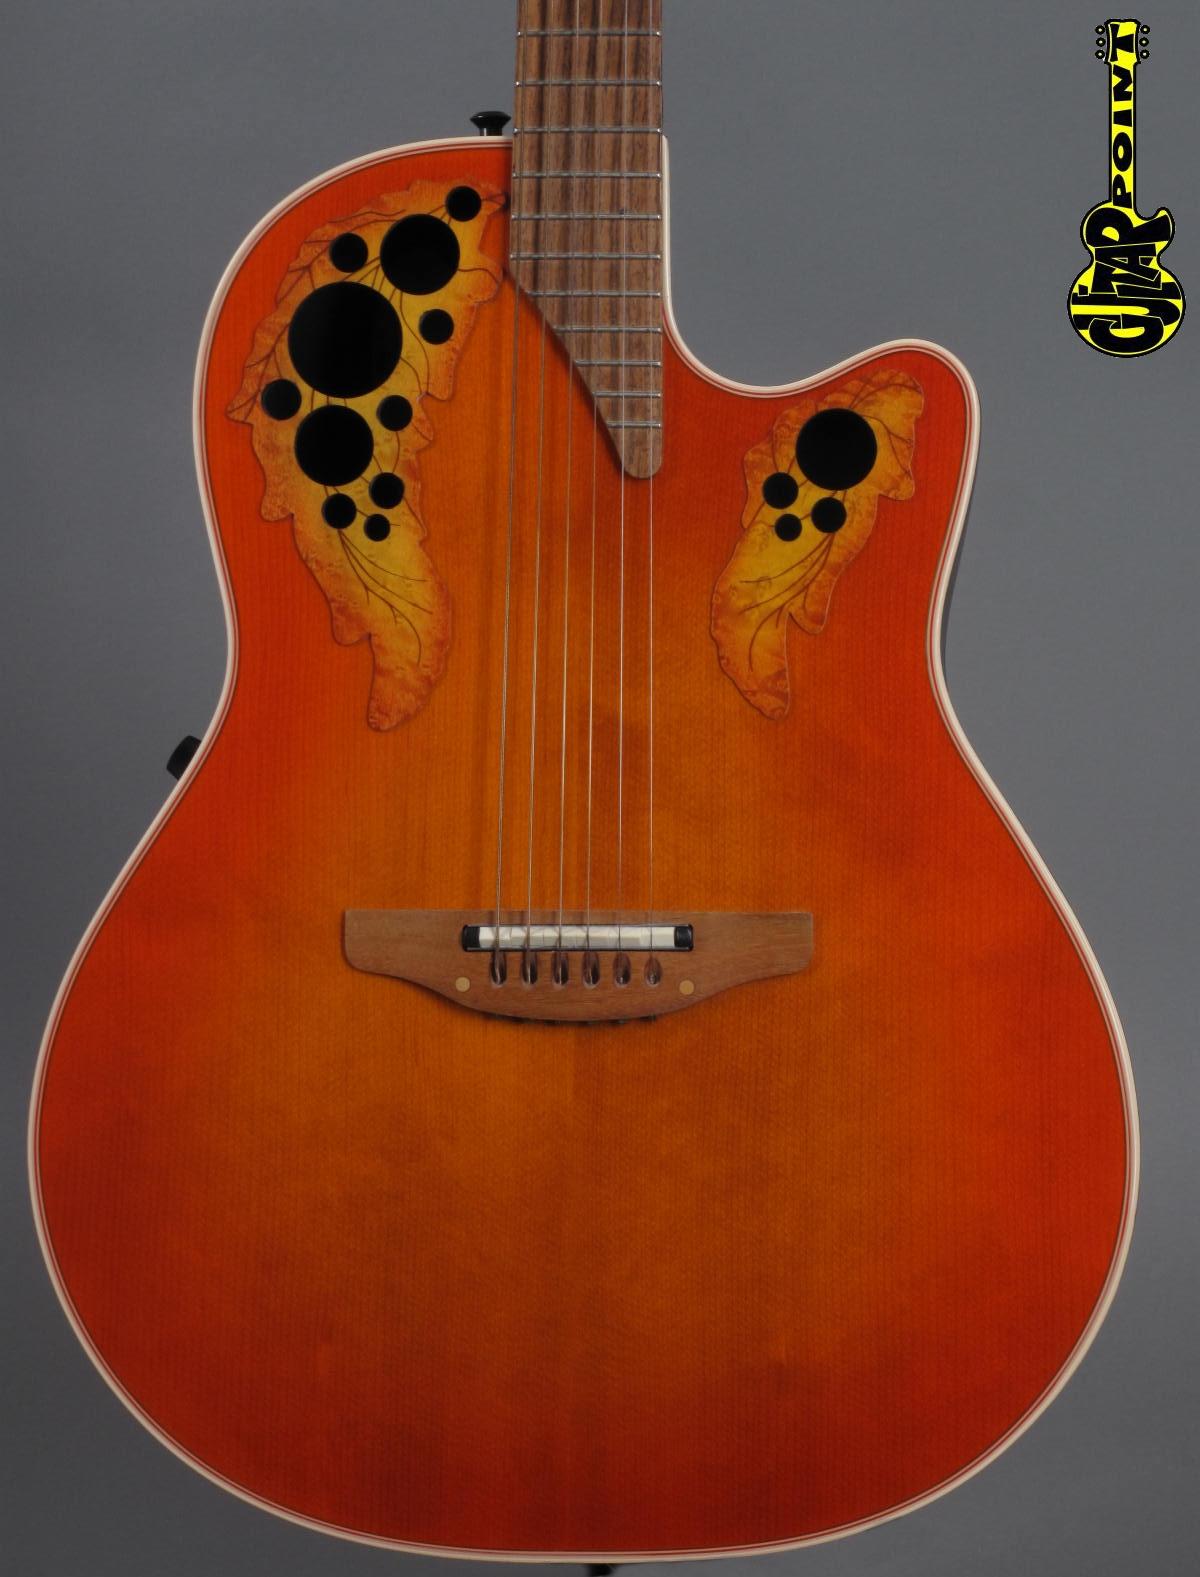 1994 Ovation Elite Standard Model 6768 - Orange Cherry Burst